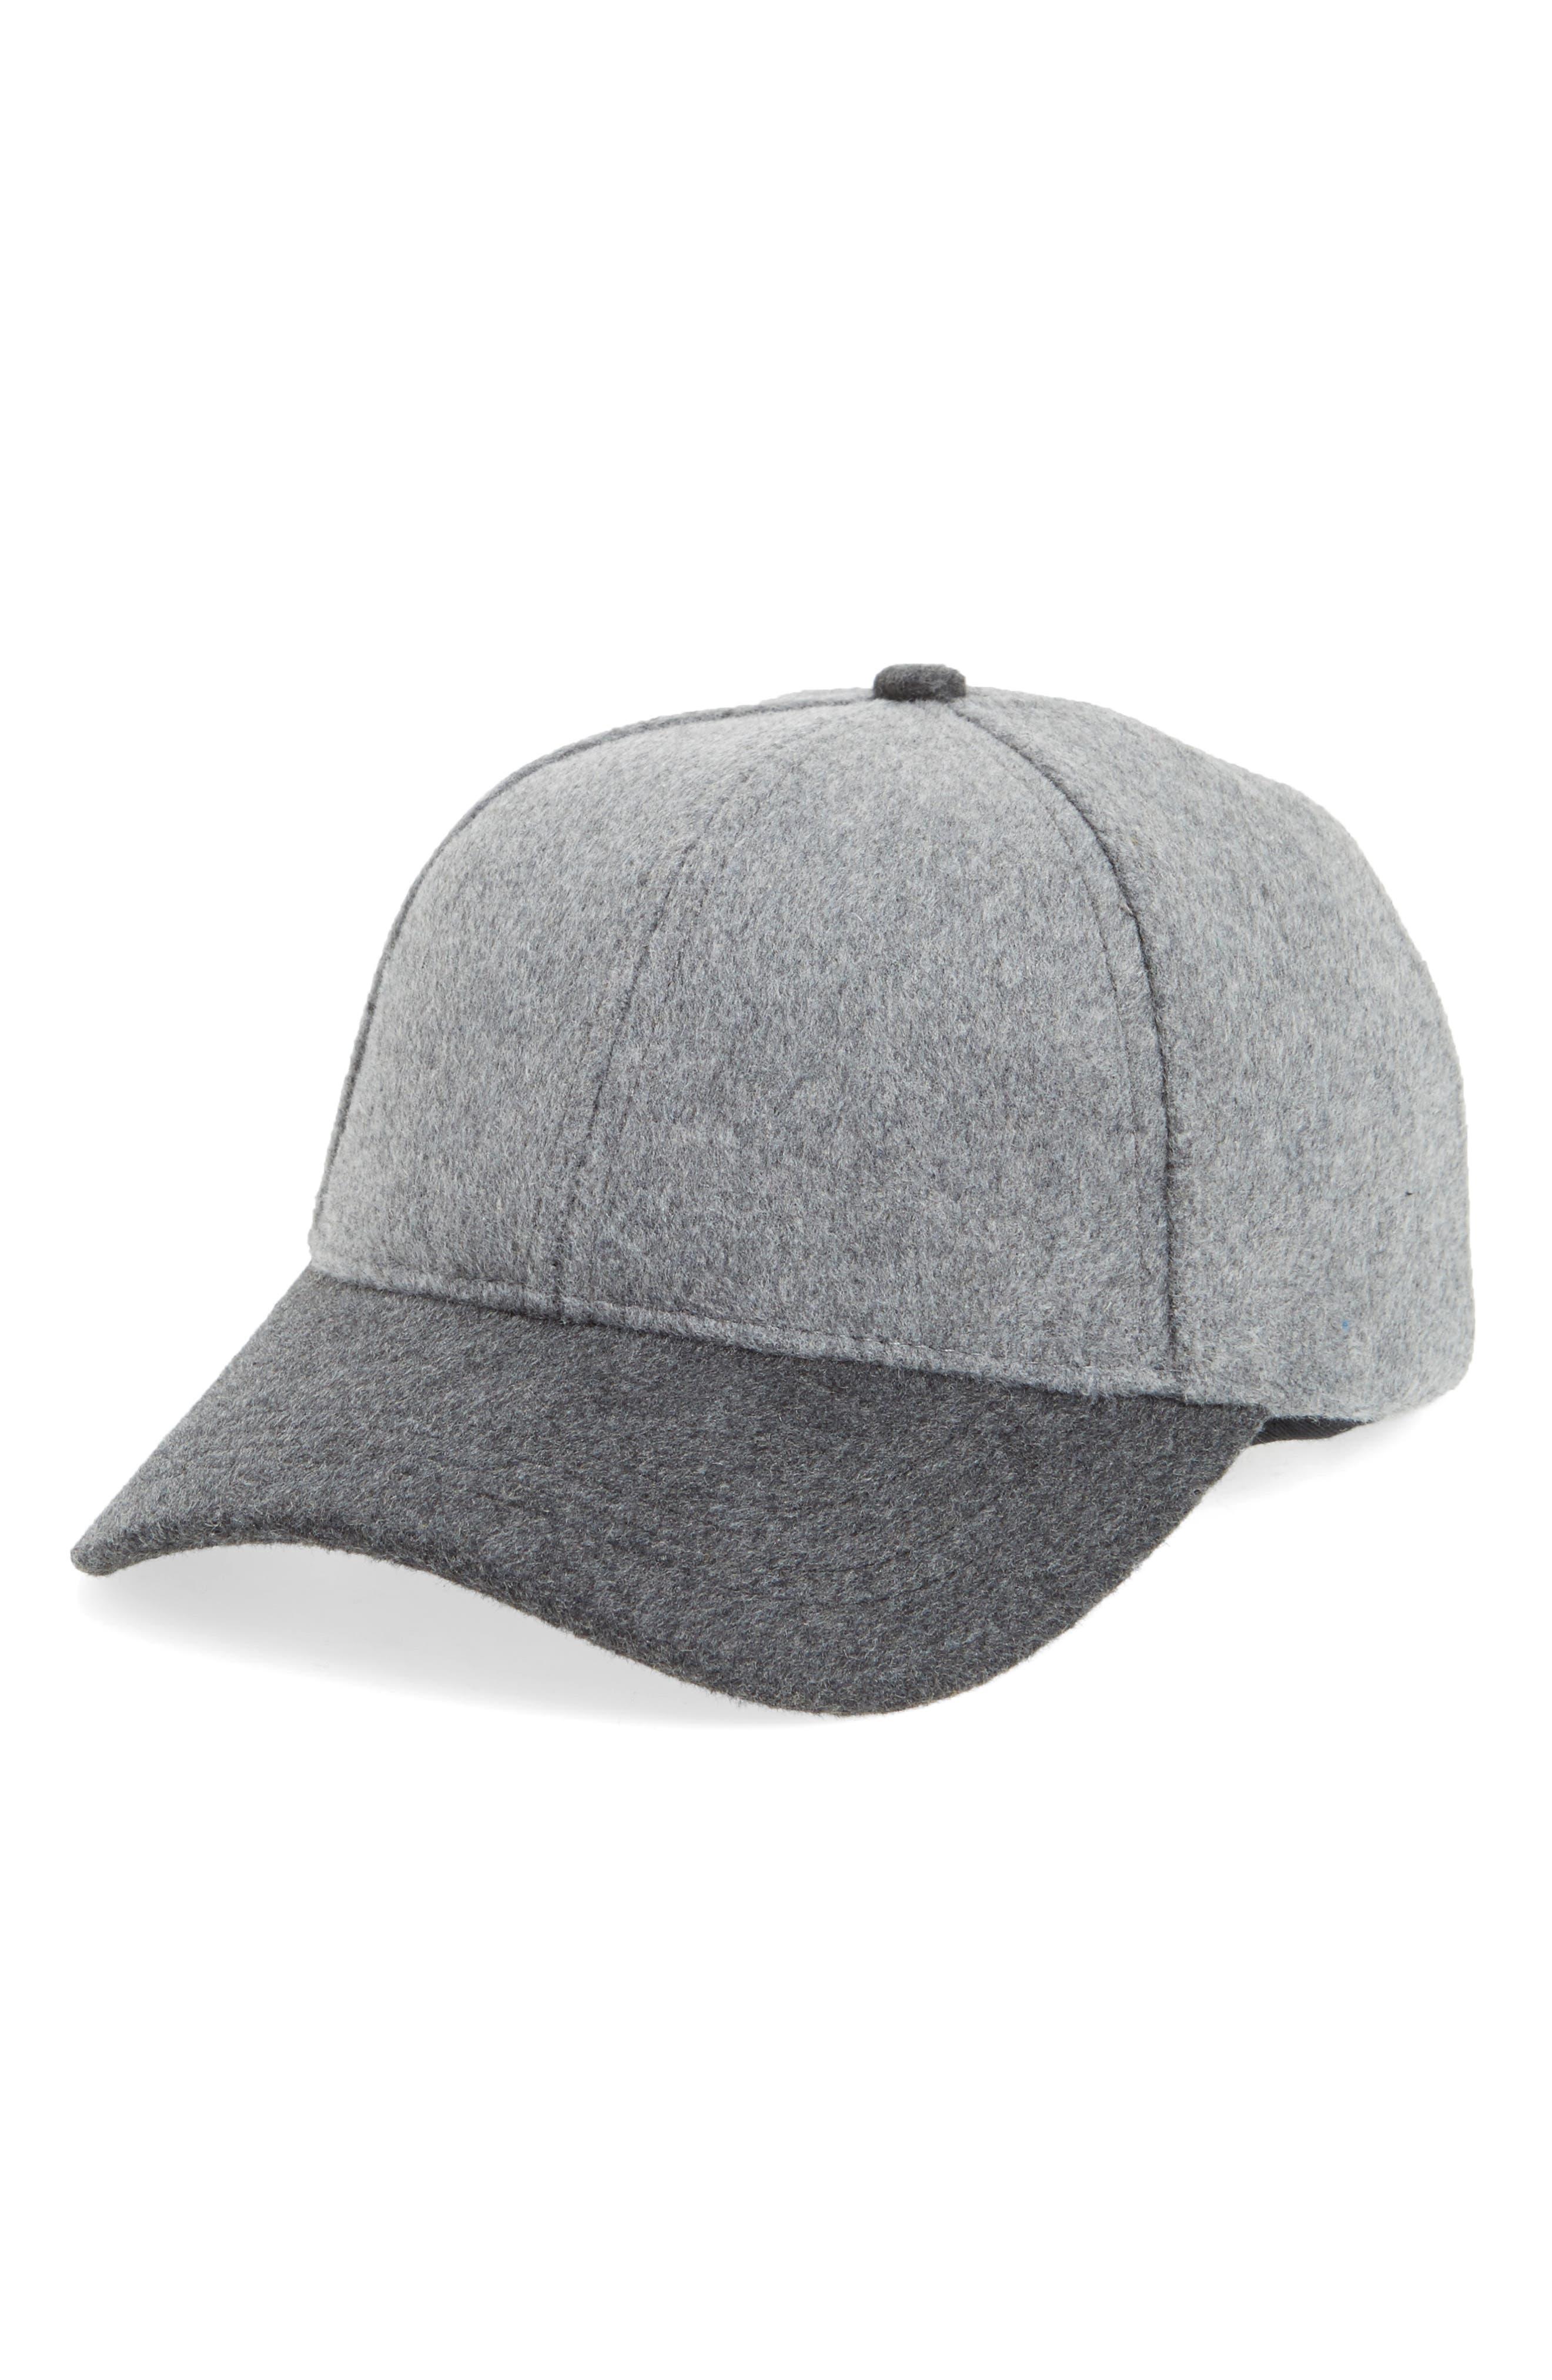 Two-Tone Baseball Cap,                         Main,                         color, Grey Combo